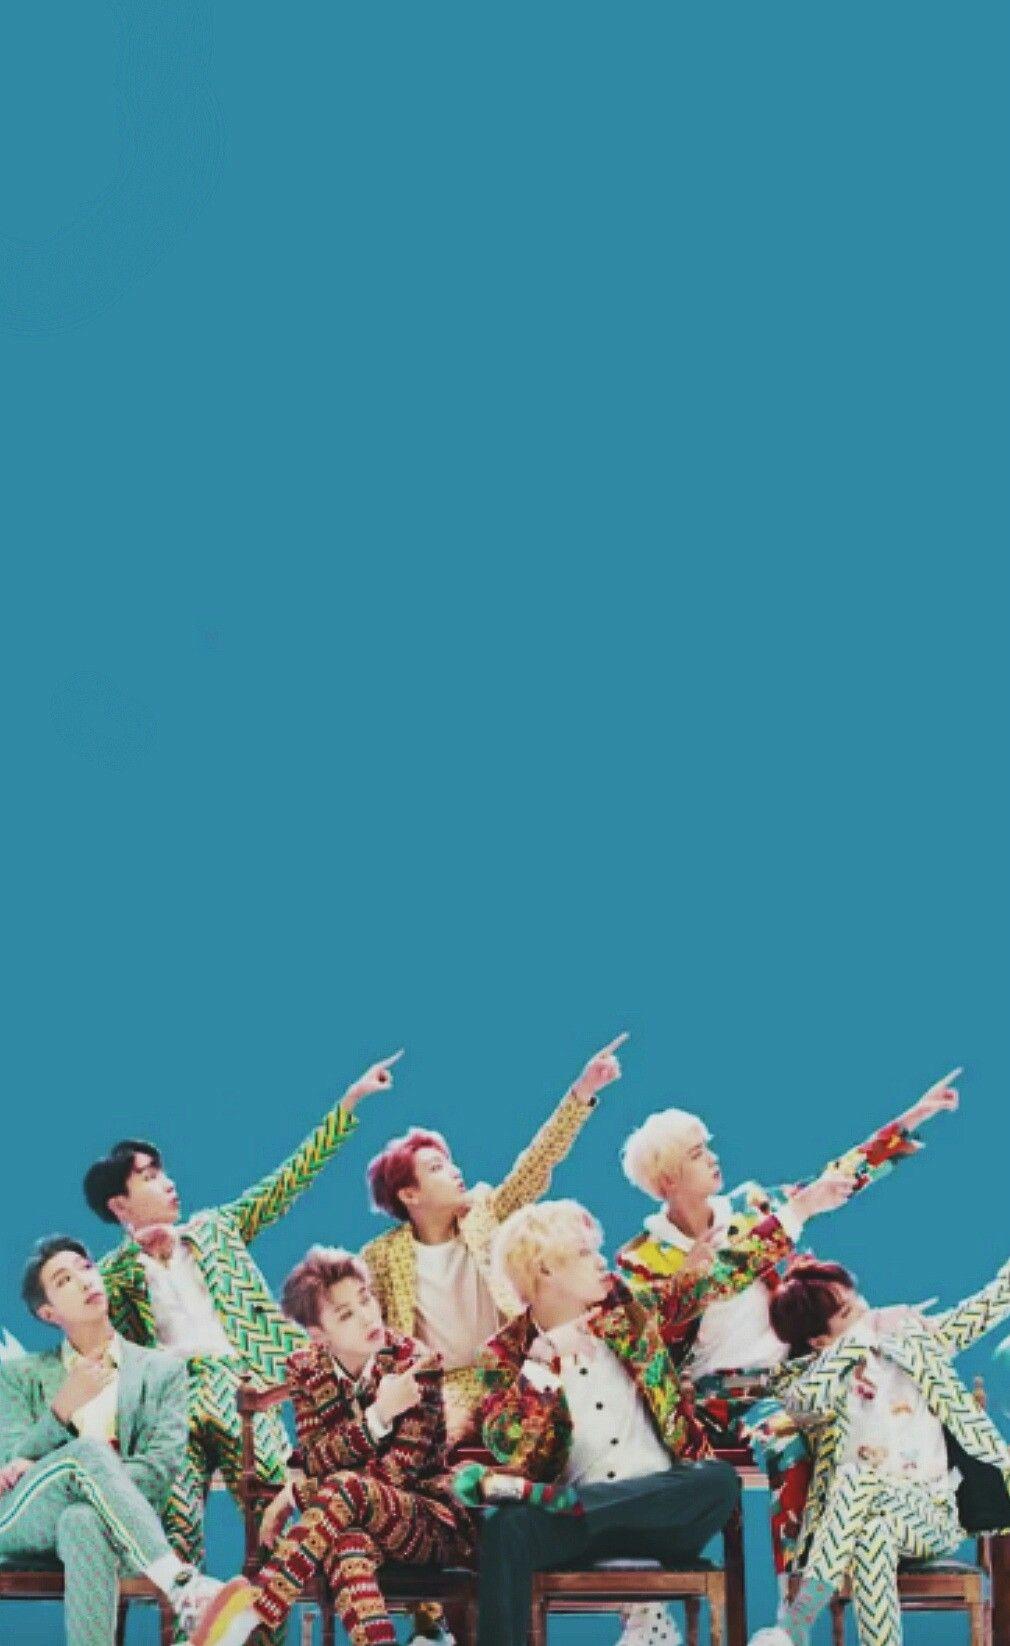 BTS LOVE YOURSELF Answer Jin, Suga, J Hope, RM, Jimin, V y